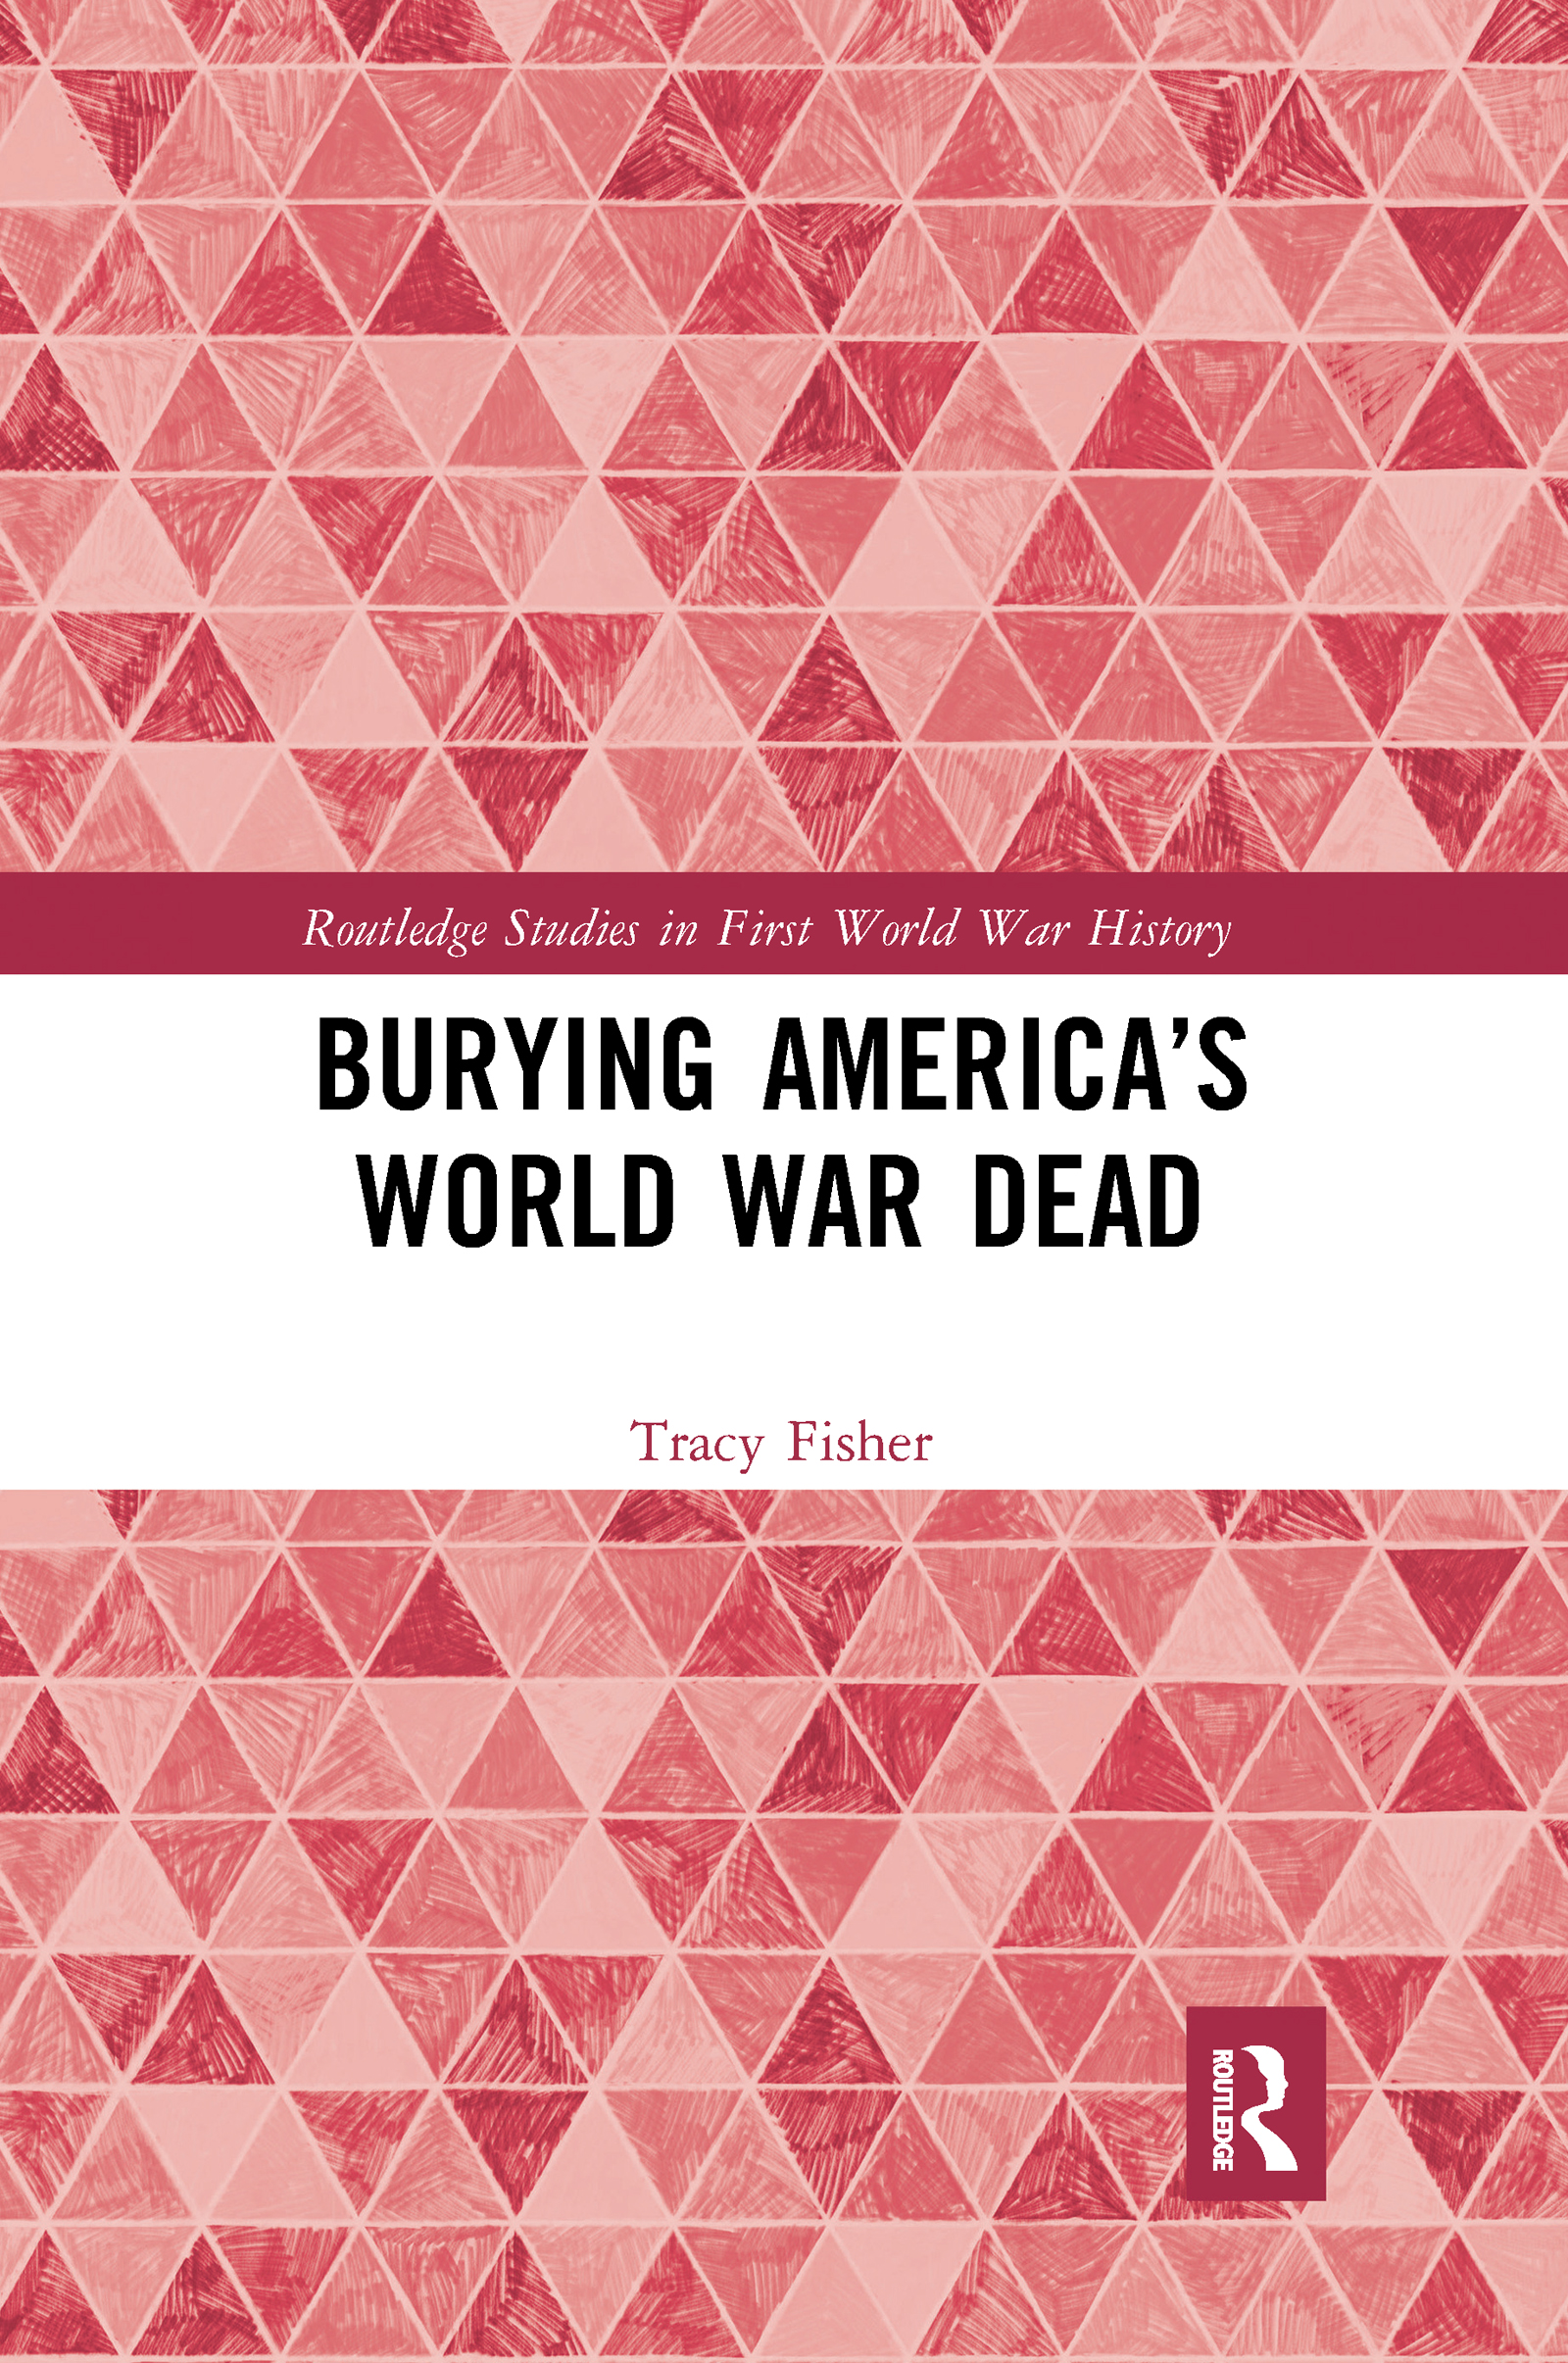 Burying America's World War Dead